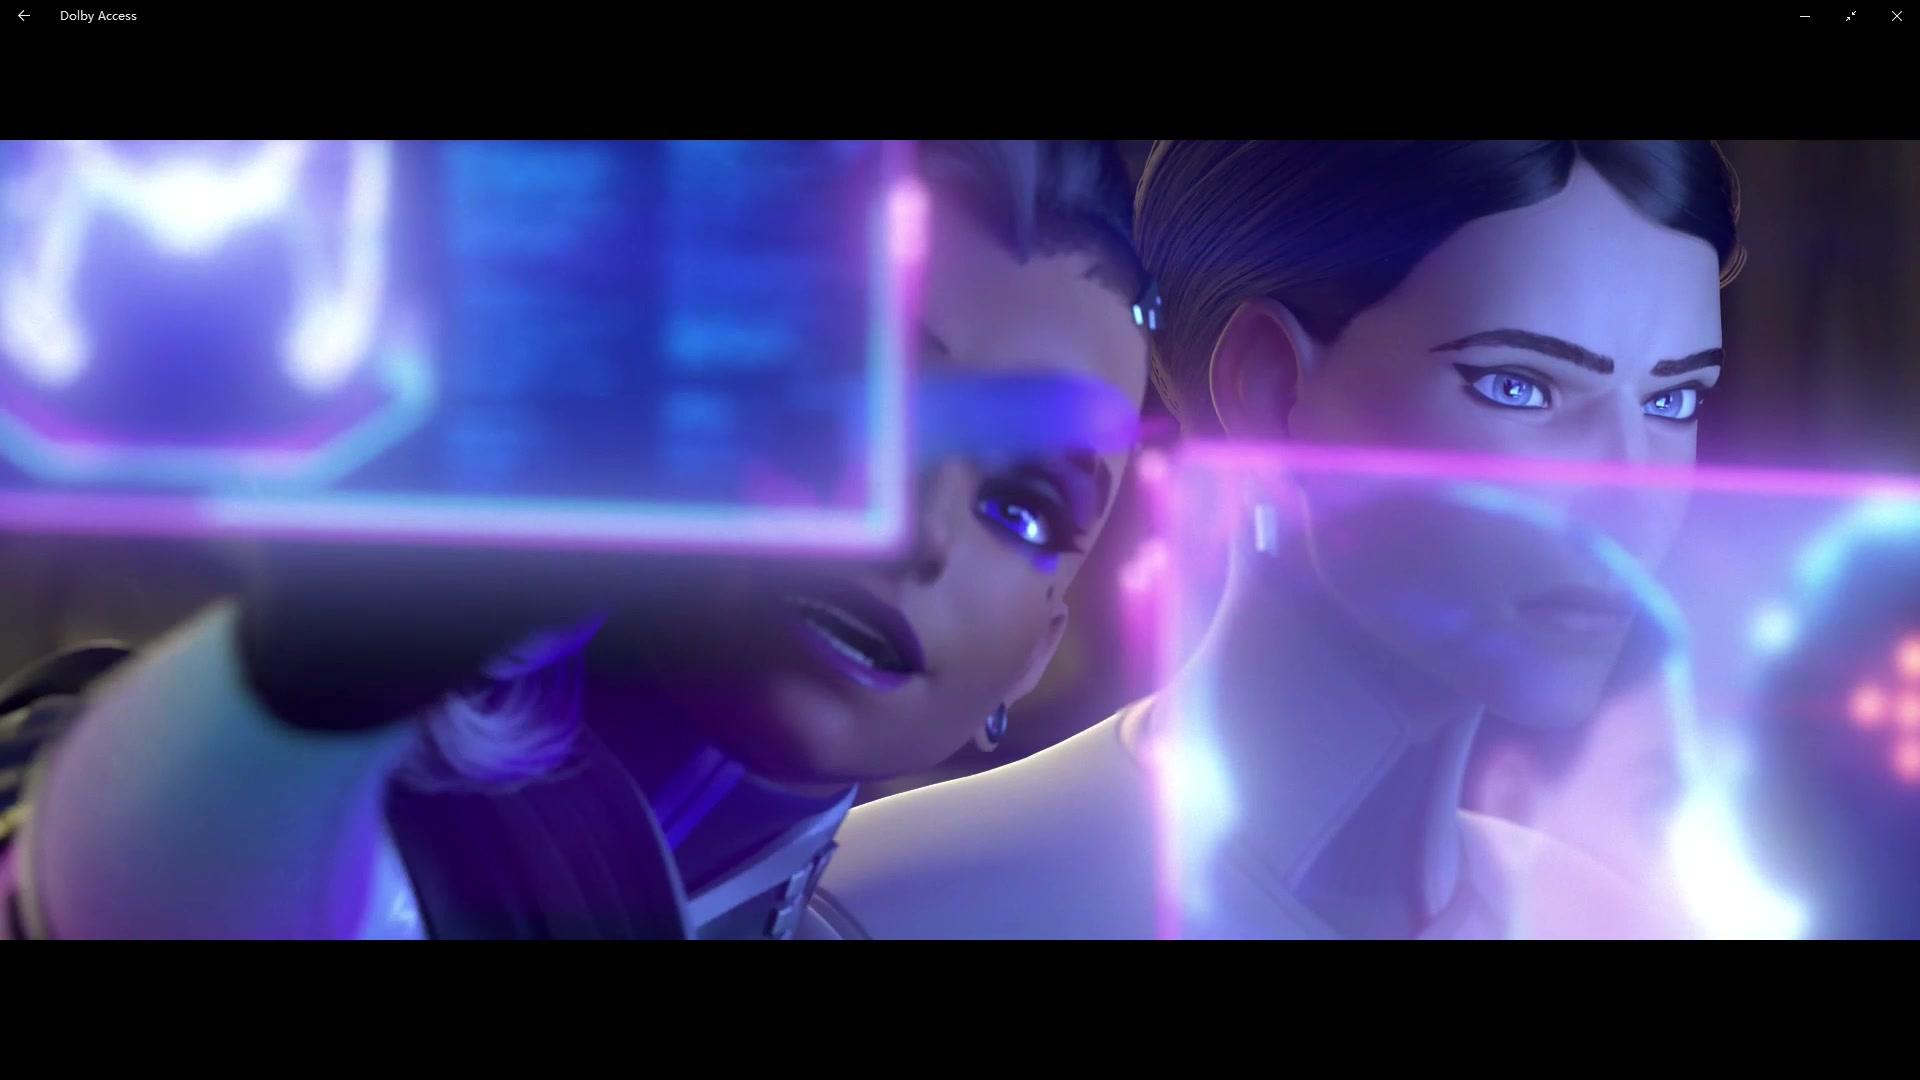 Overwatch Animated Short I Dolby Access 2017_12_23 11_36_26_哔哩哔哩 (゜-゜)つロ  干杯~-bilibili